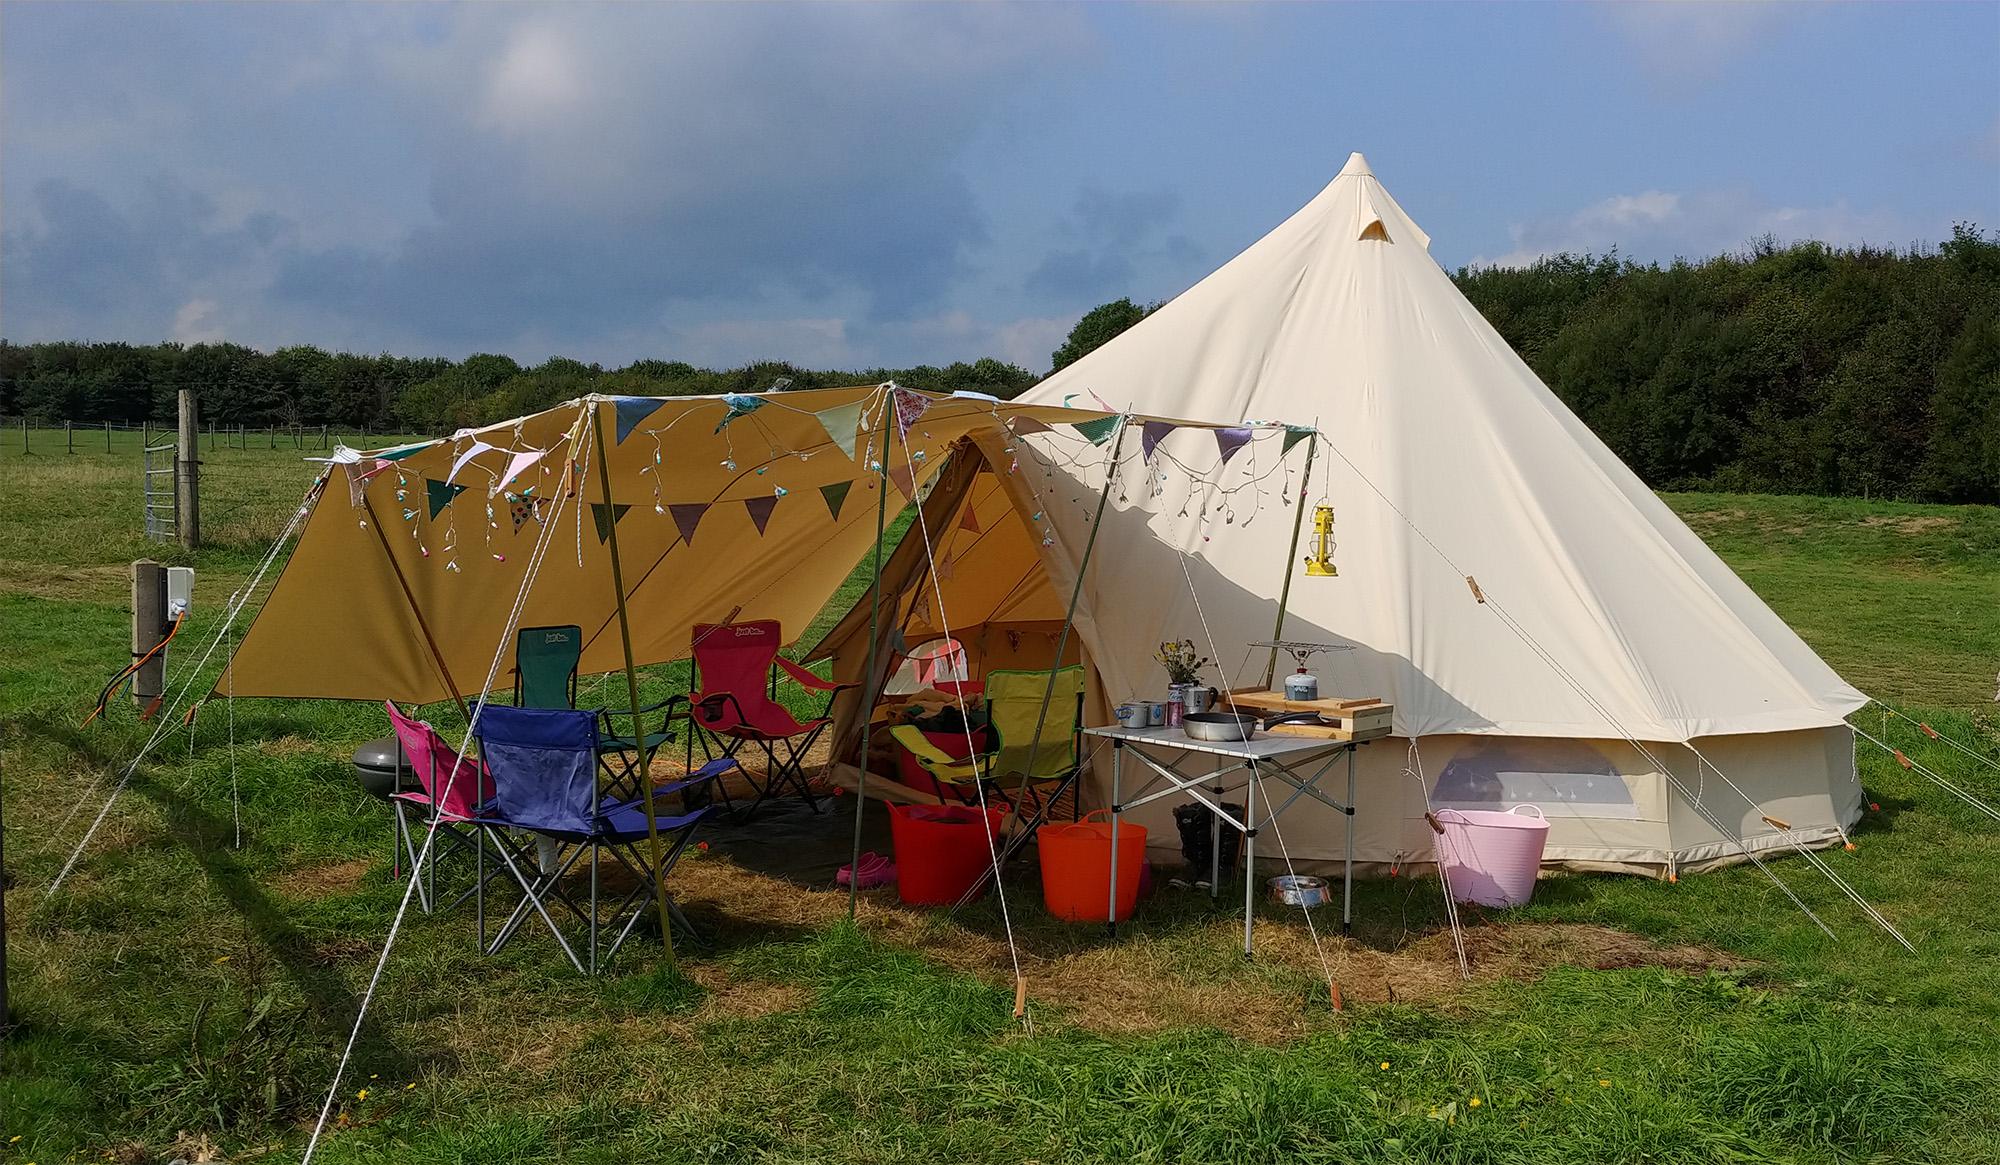 STN-IoW-Fakenham-Farm-Campsite-Bell.jpg